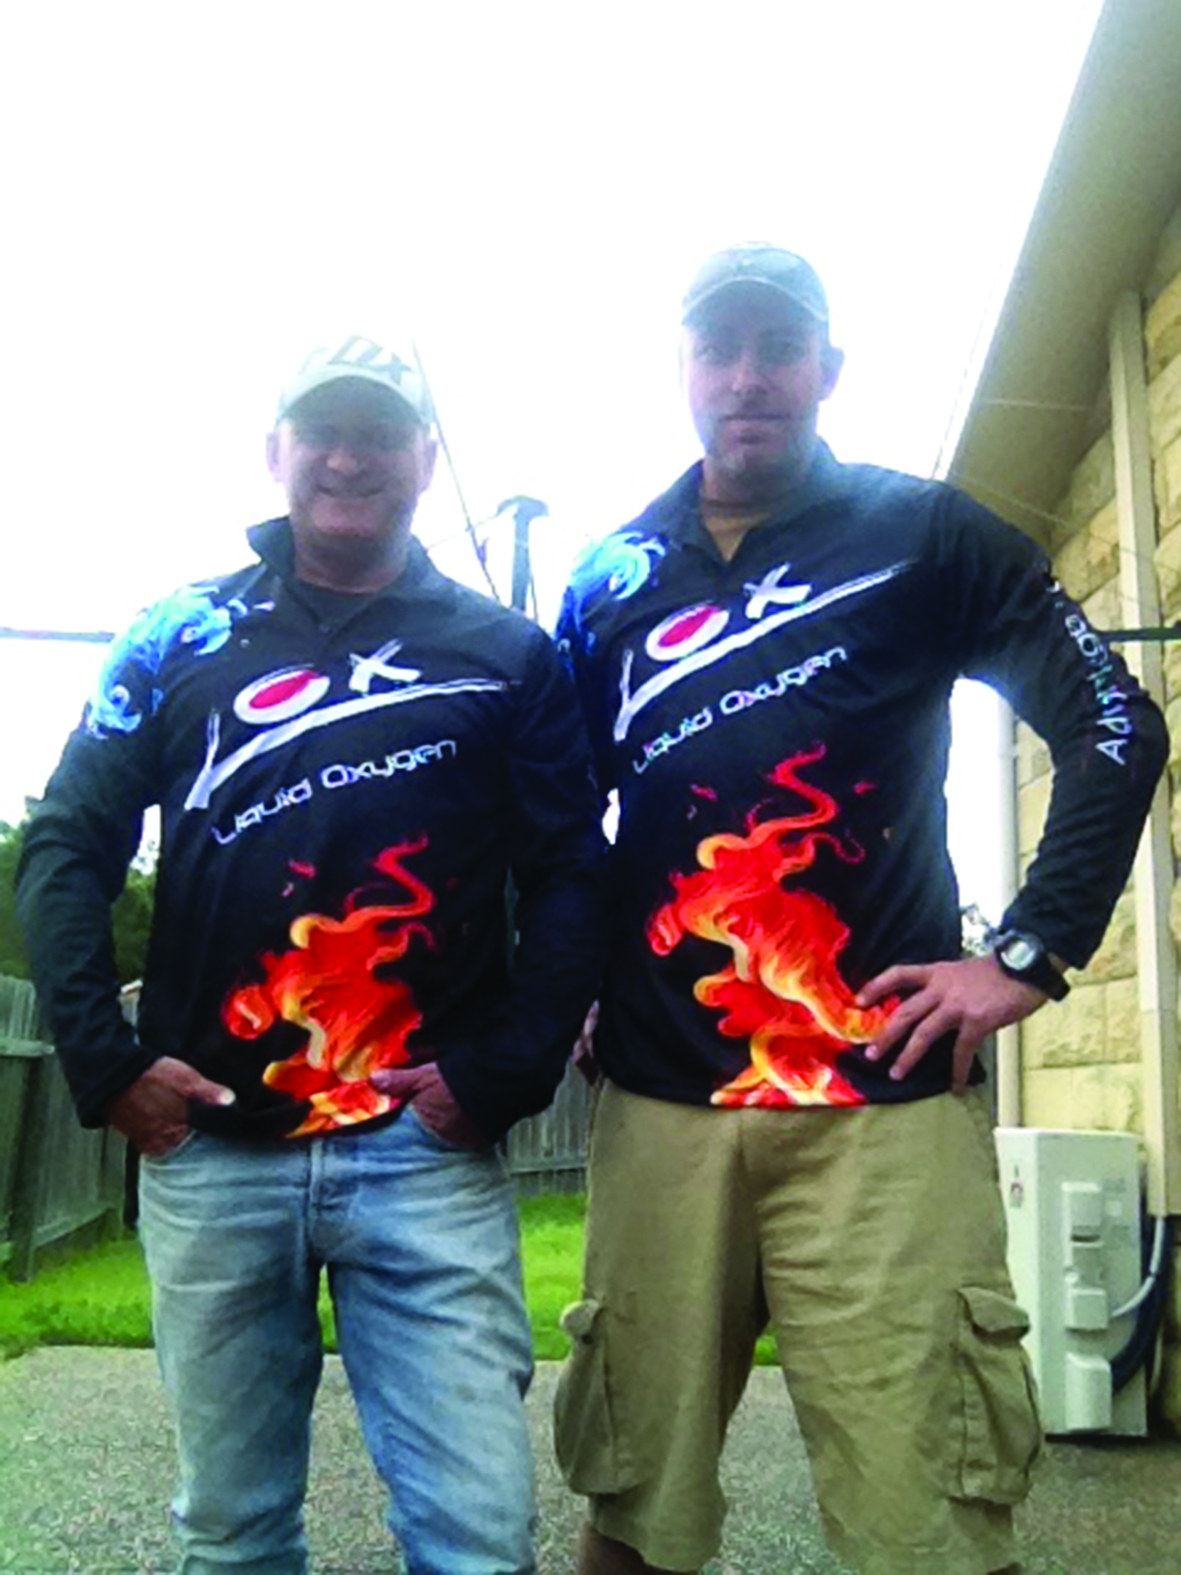 Nath and Caino in their fresh 2 Mates Fishin shirts.